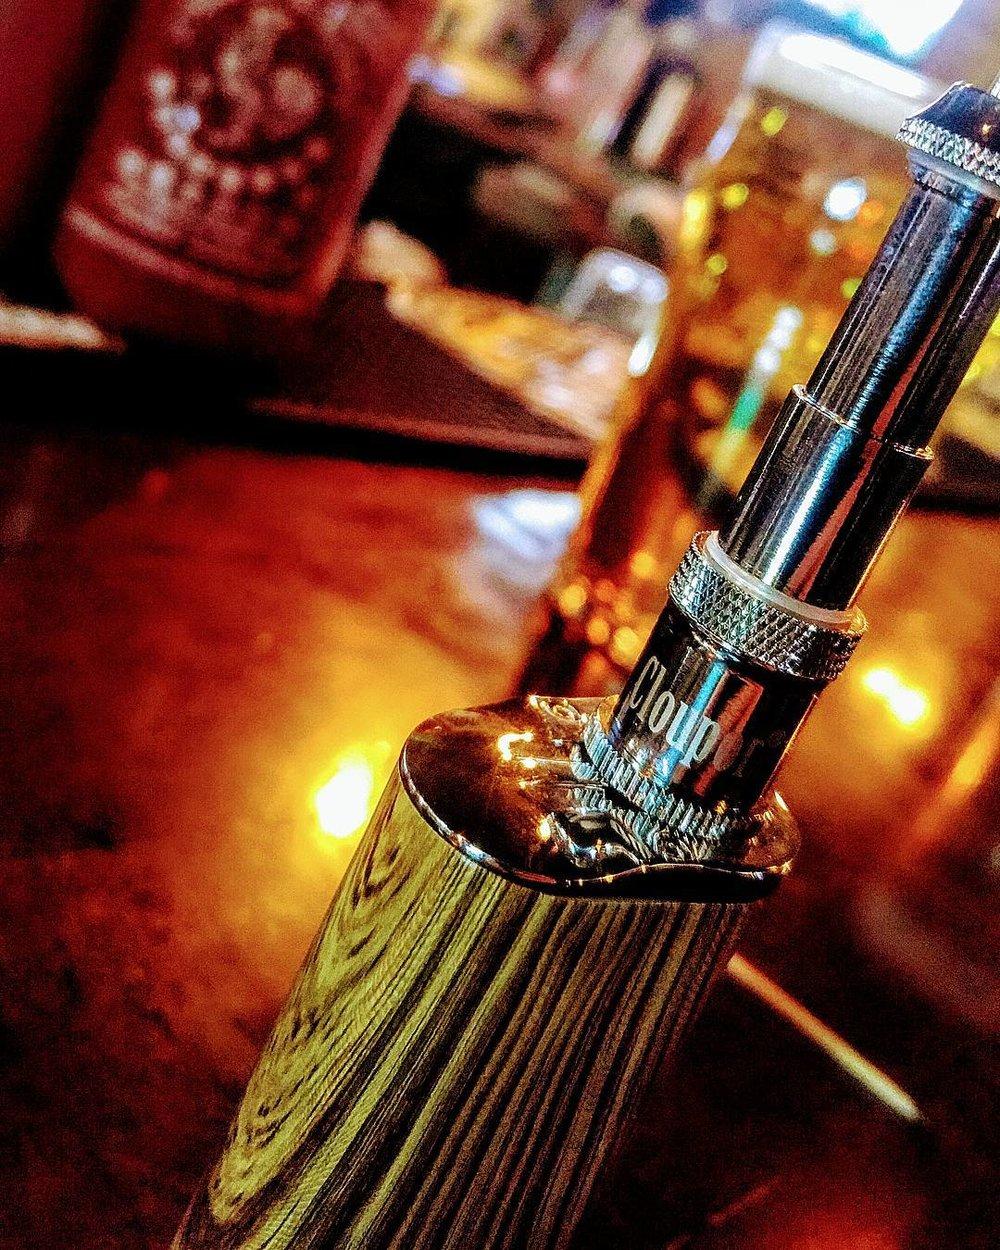 _cloupor_cloutank_V2_is_incredible._Sold_here.__vape__weed__pipes__420__710__marijuana__highsociety__highlyfe__weedstagram.jpg